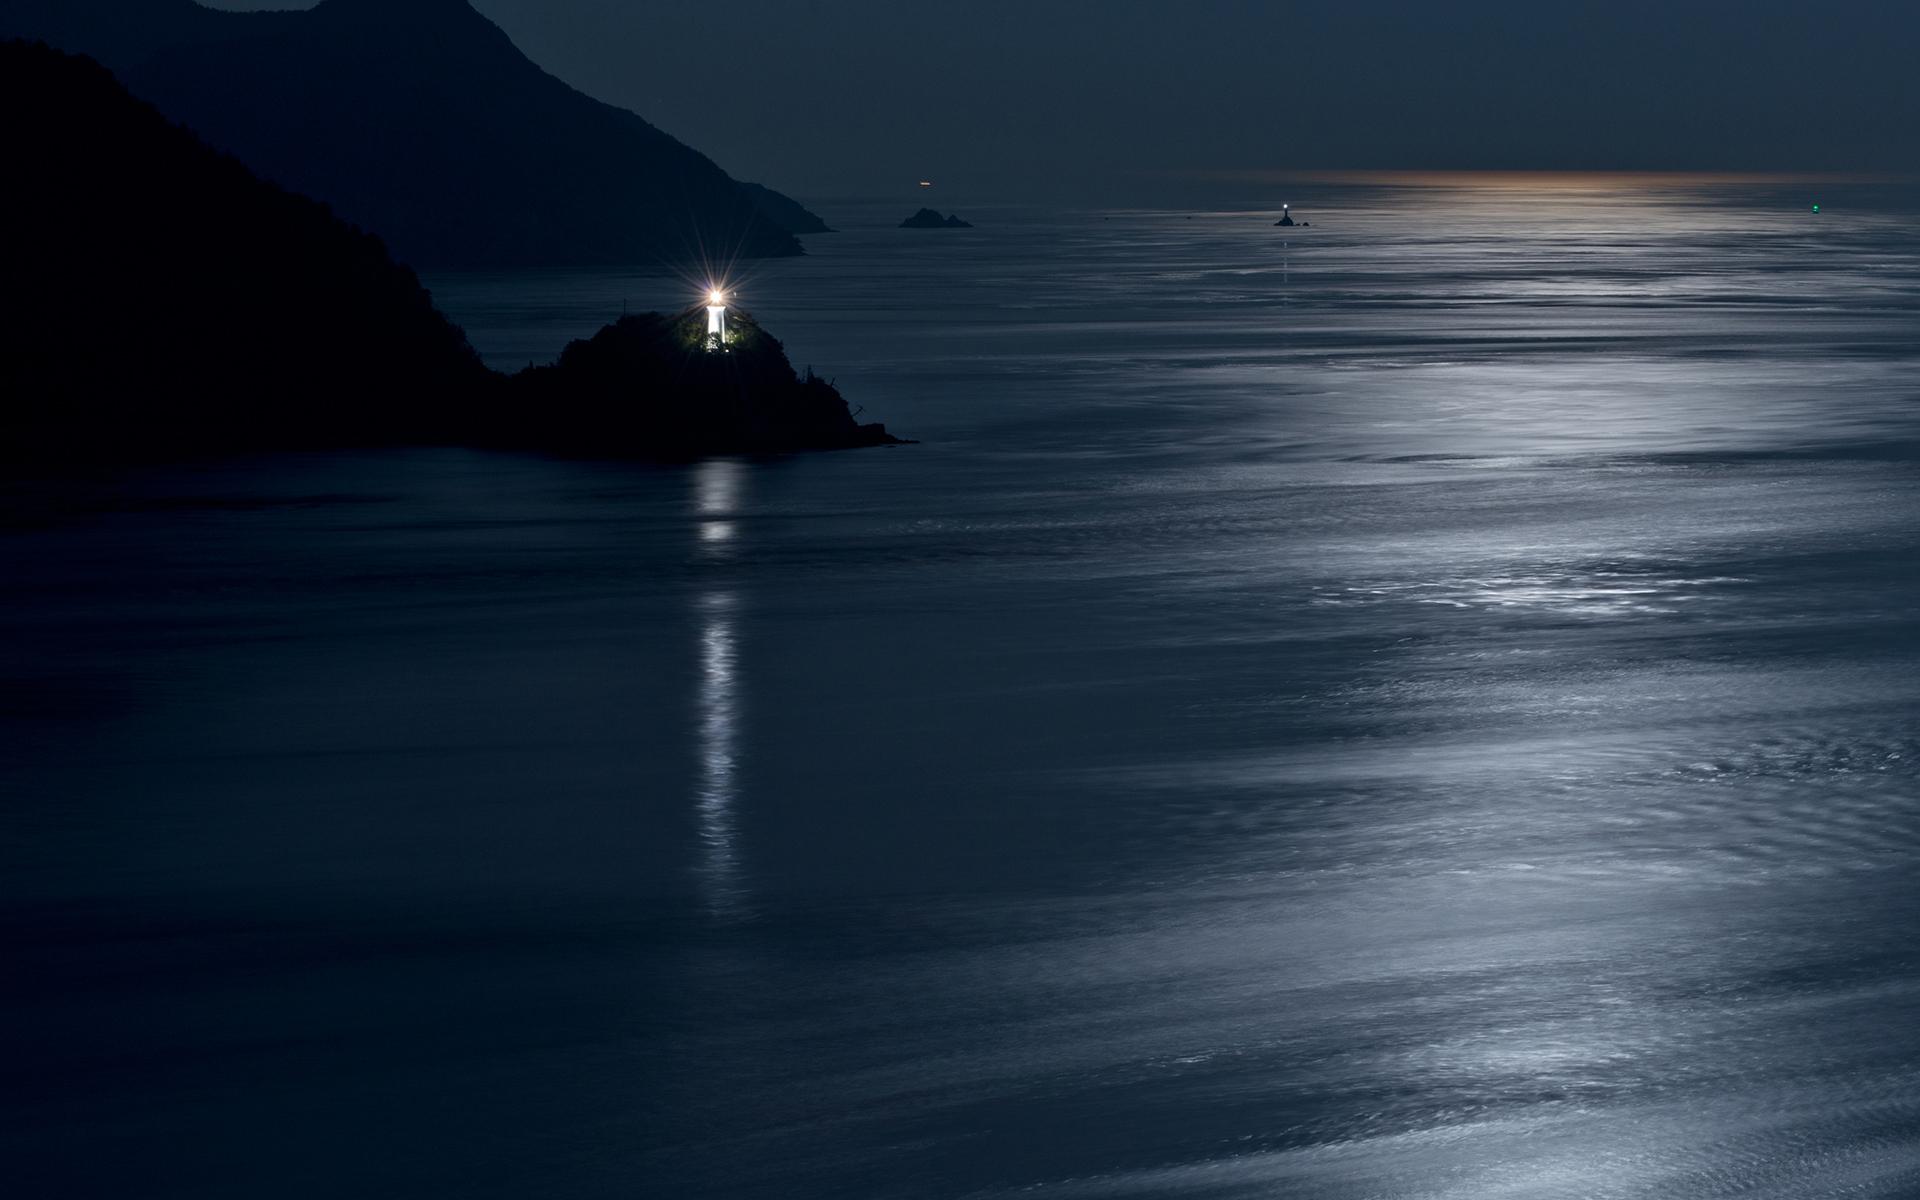 Lighthouse Coast night ocean sea reflection moon moonlight lights 1920x1200